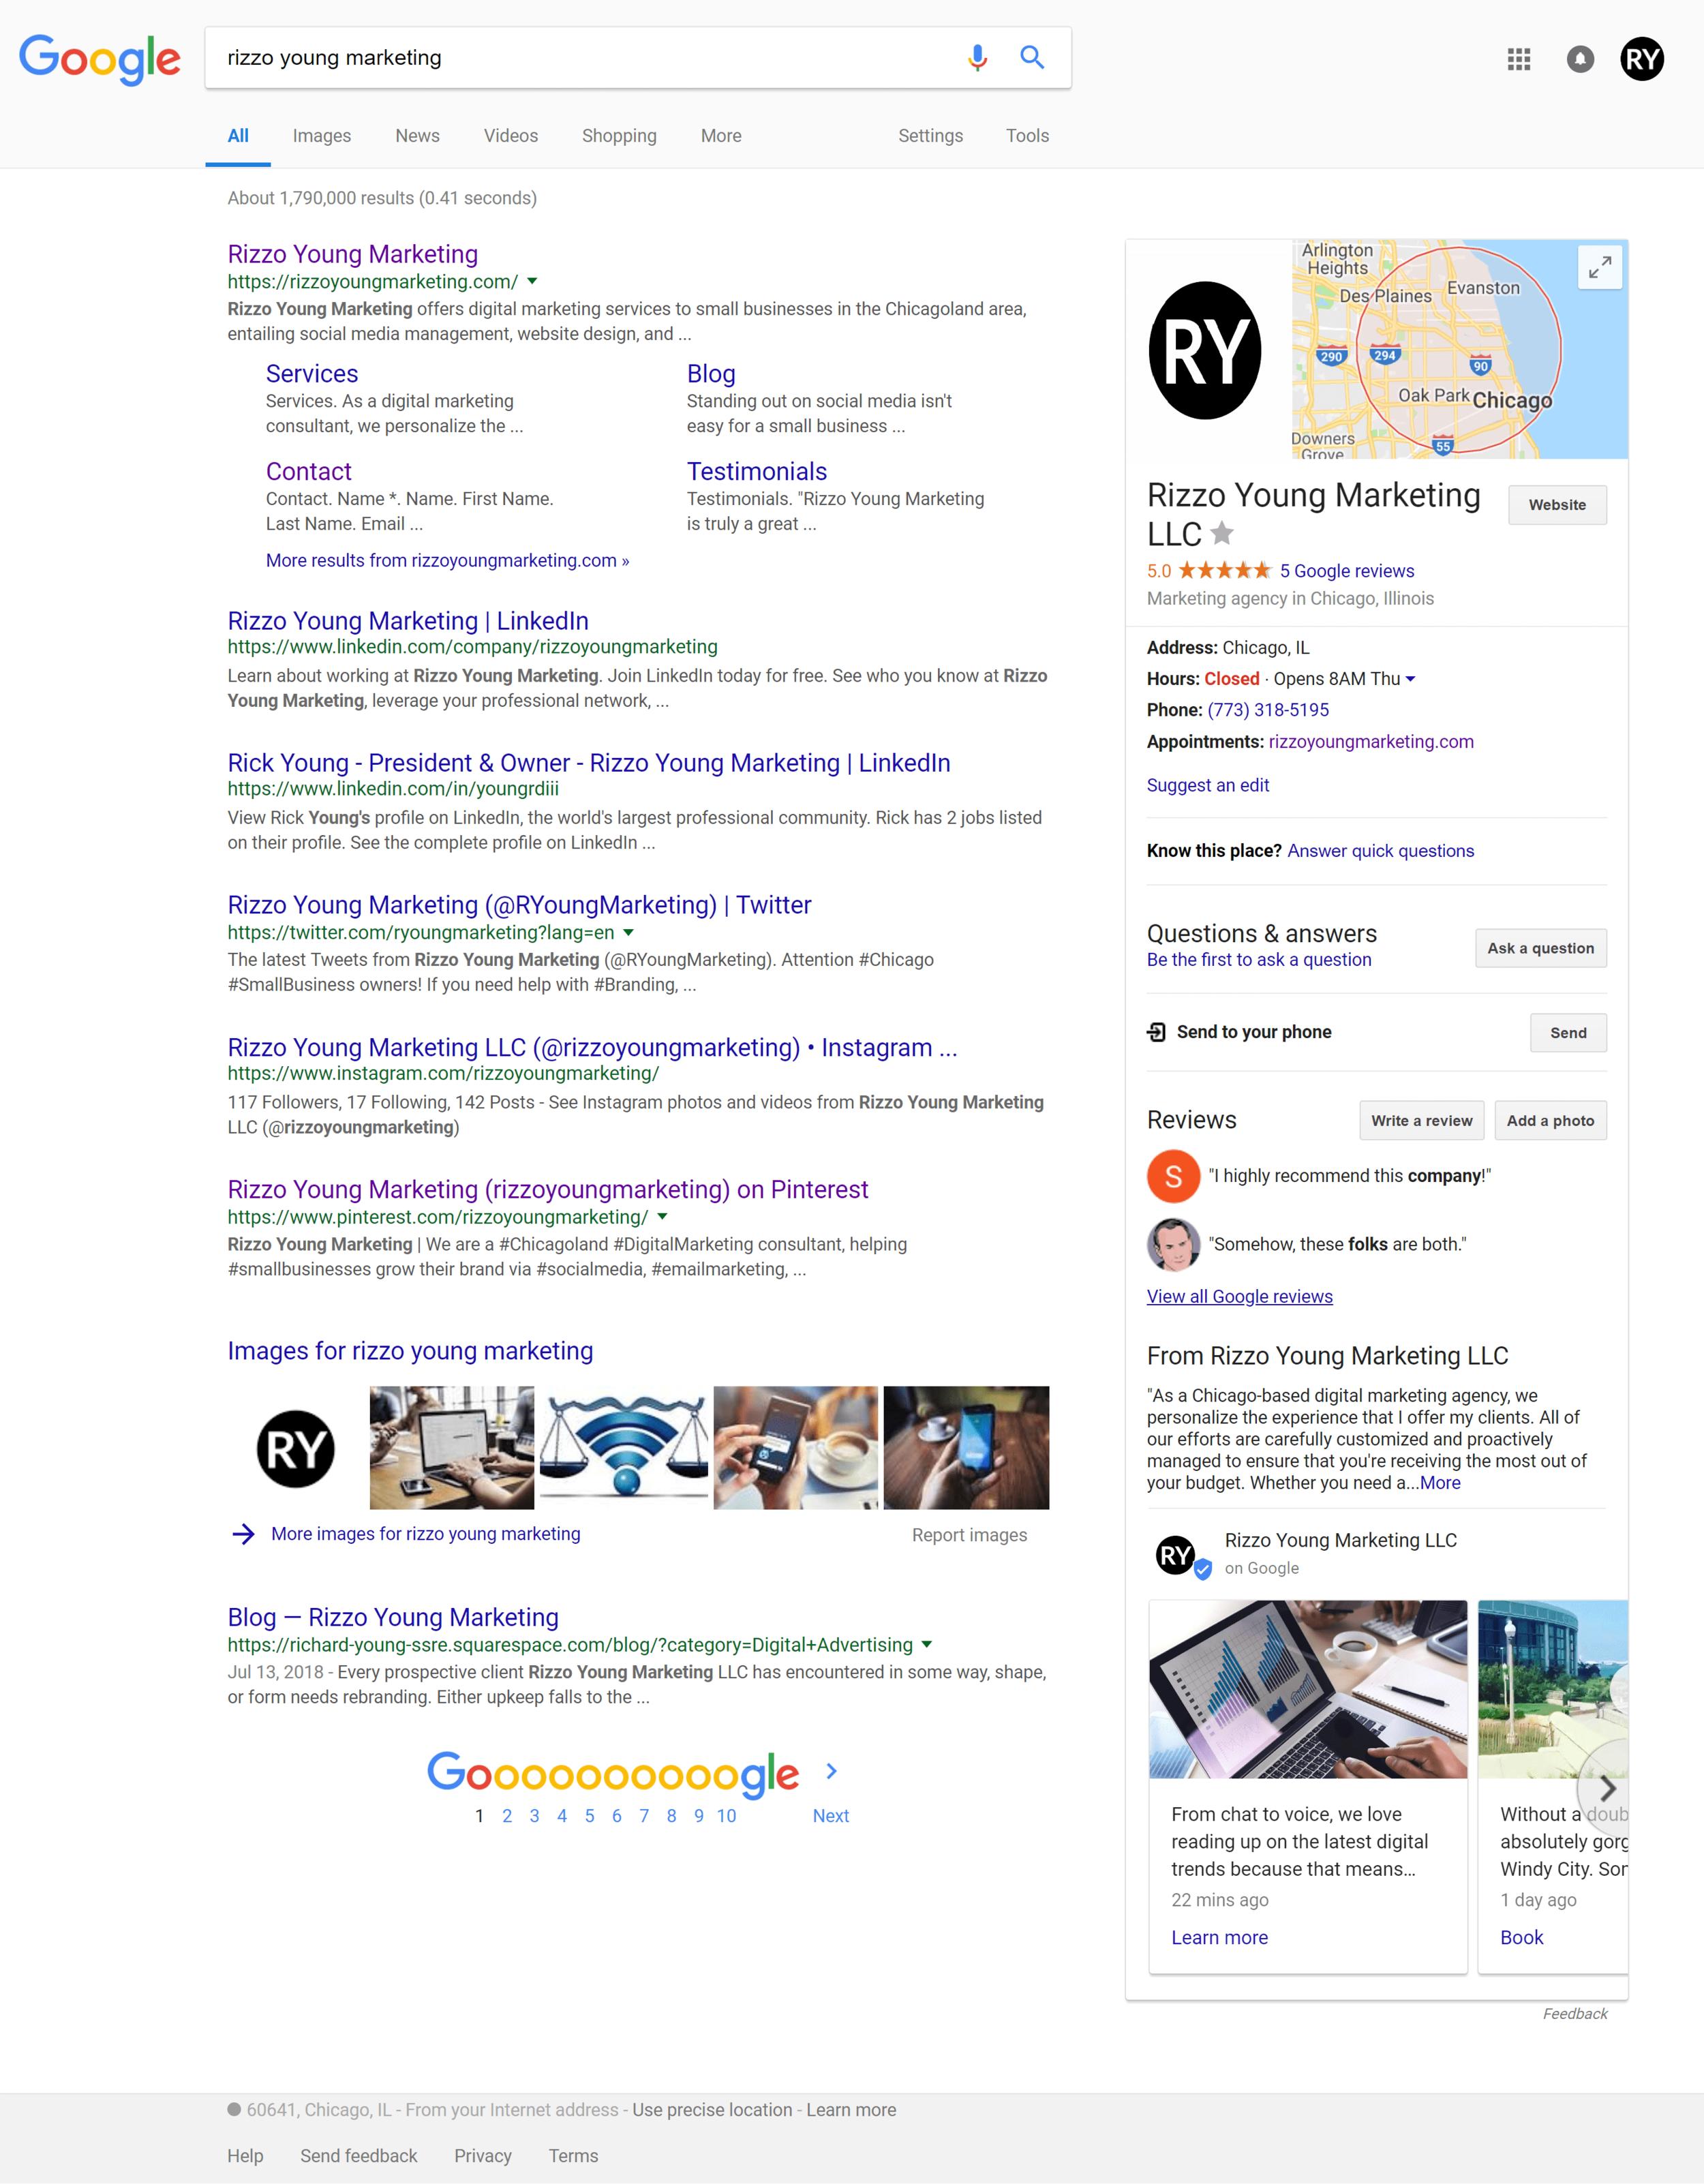 Rizzo-Young-Marketing-LLC-Google-Search-SEO-Minimized.png